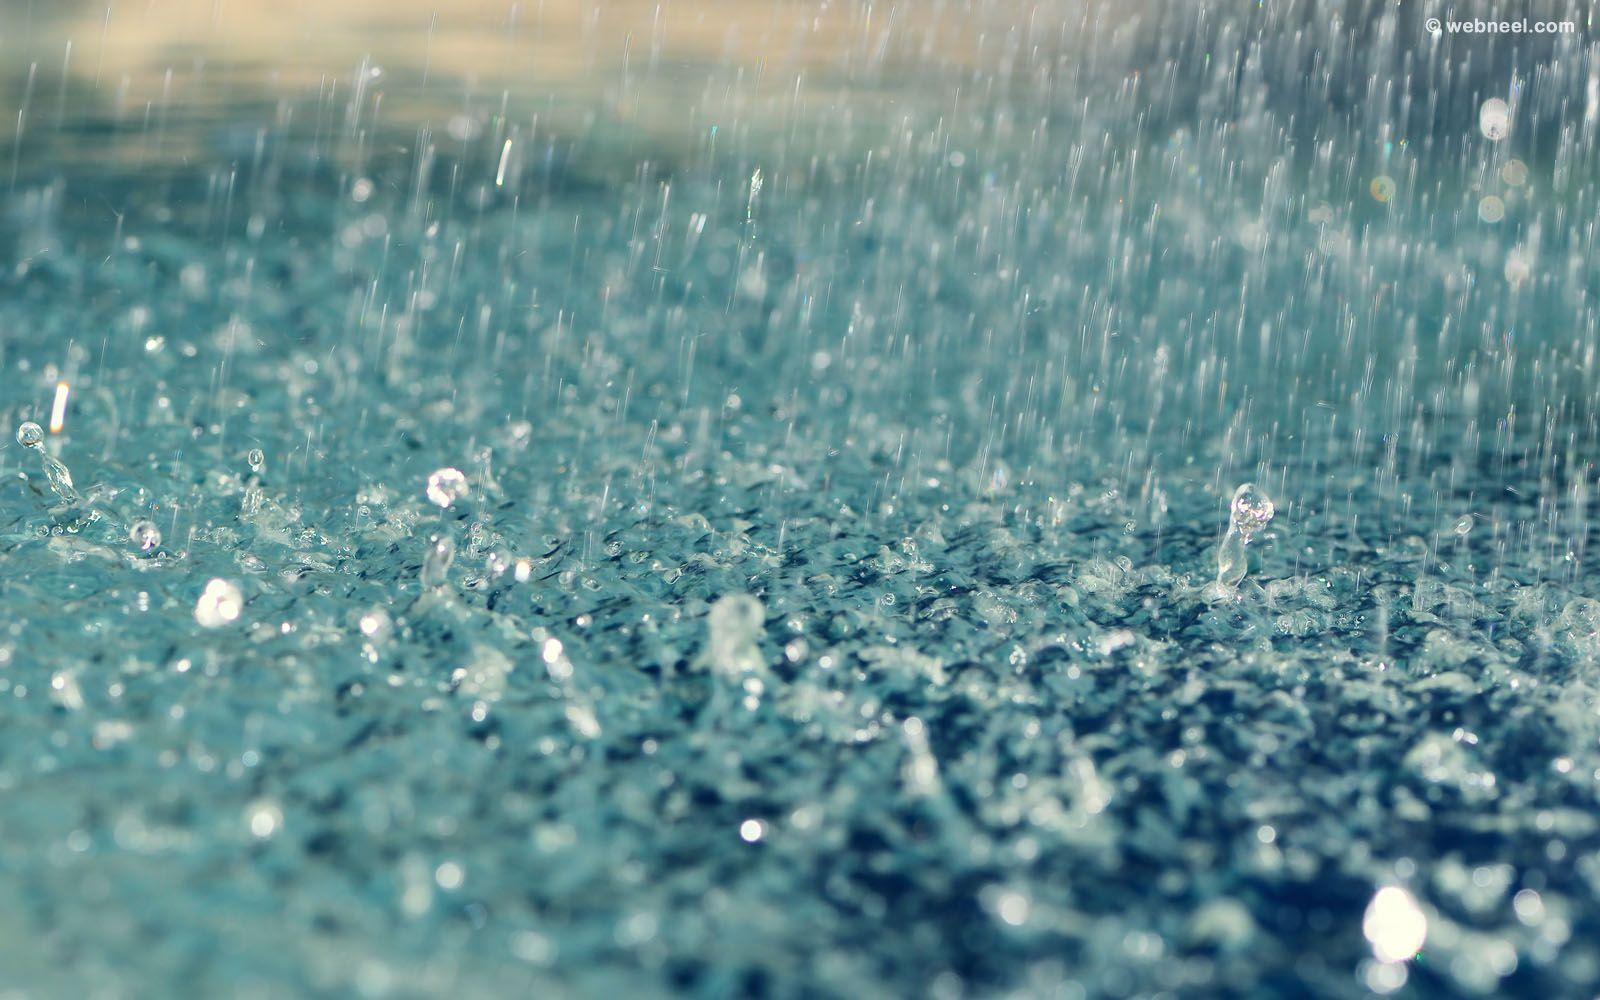 Raining Hd Wallpapers Wallpaper Cave